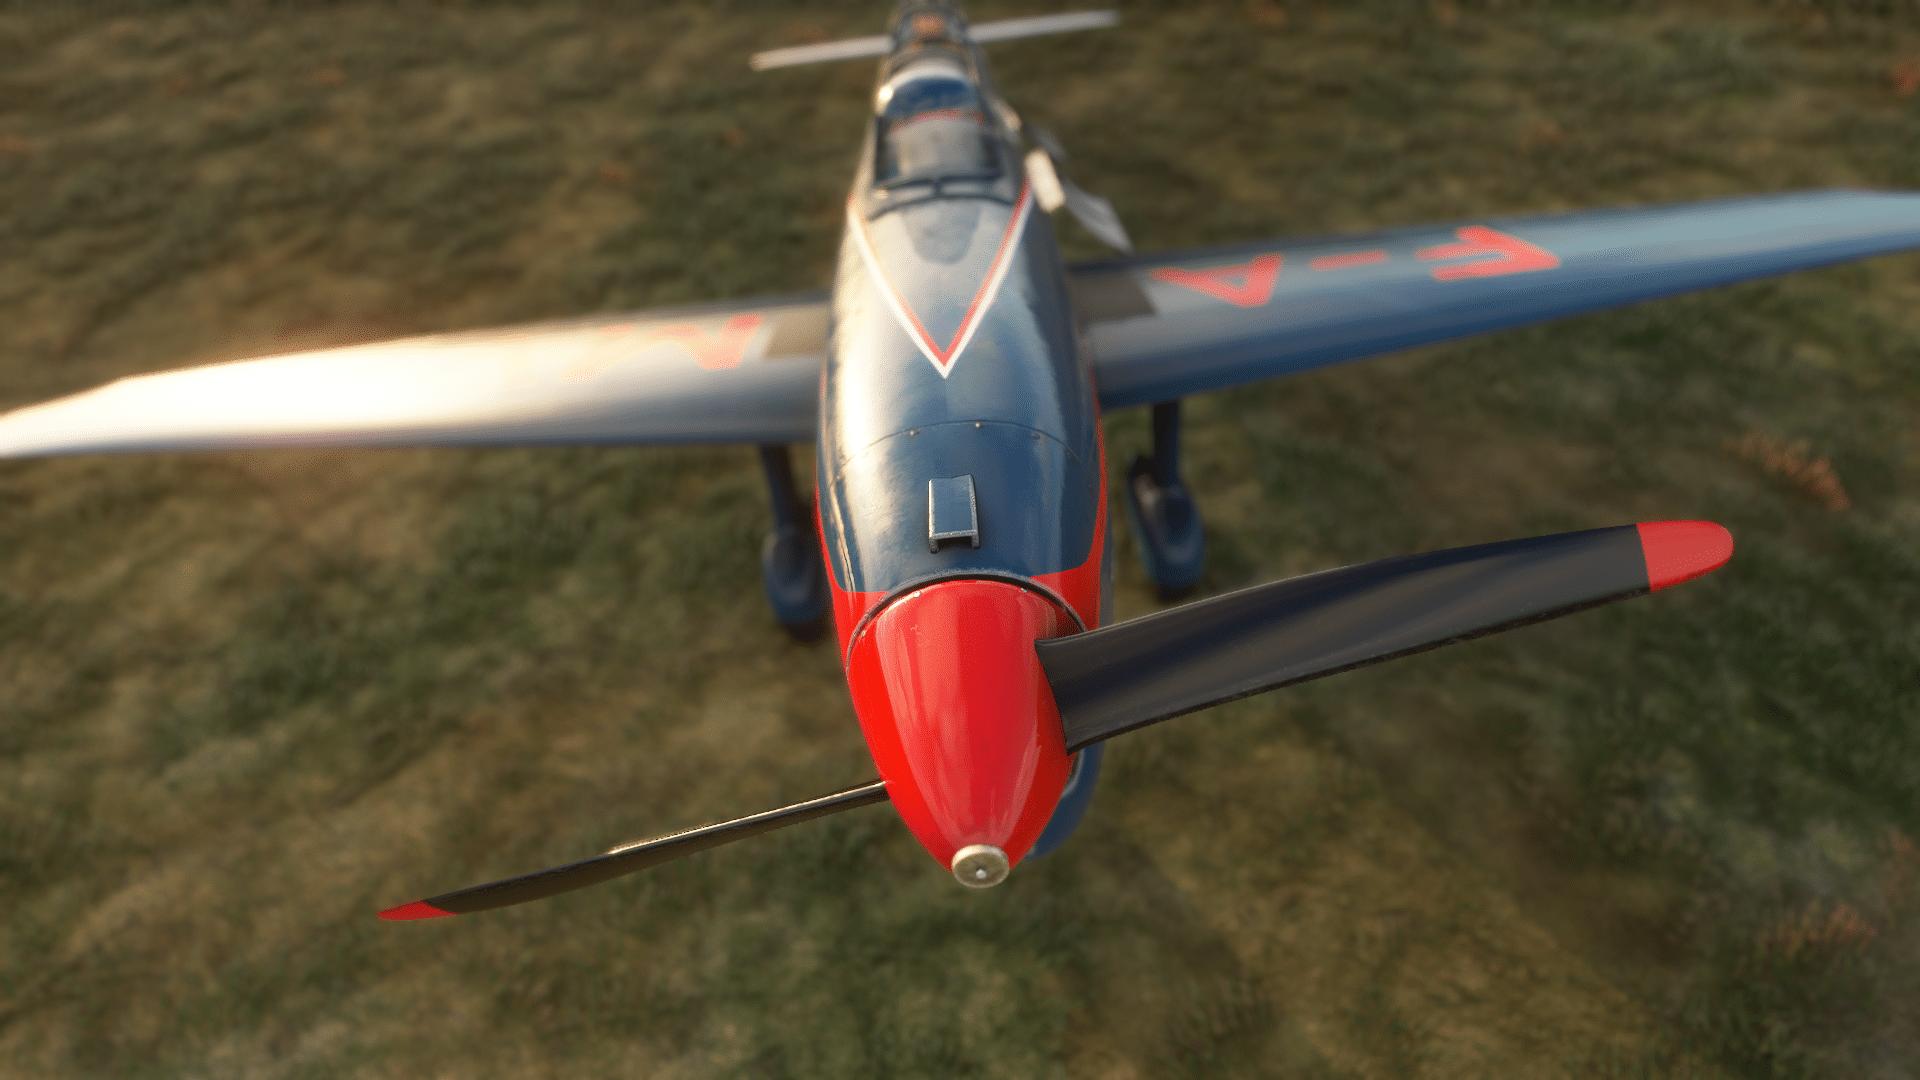 266270_Microsoft_Flight_Simulator_Screenshot_2021.05.28_-_11.21.57.33